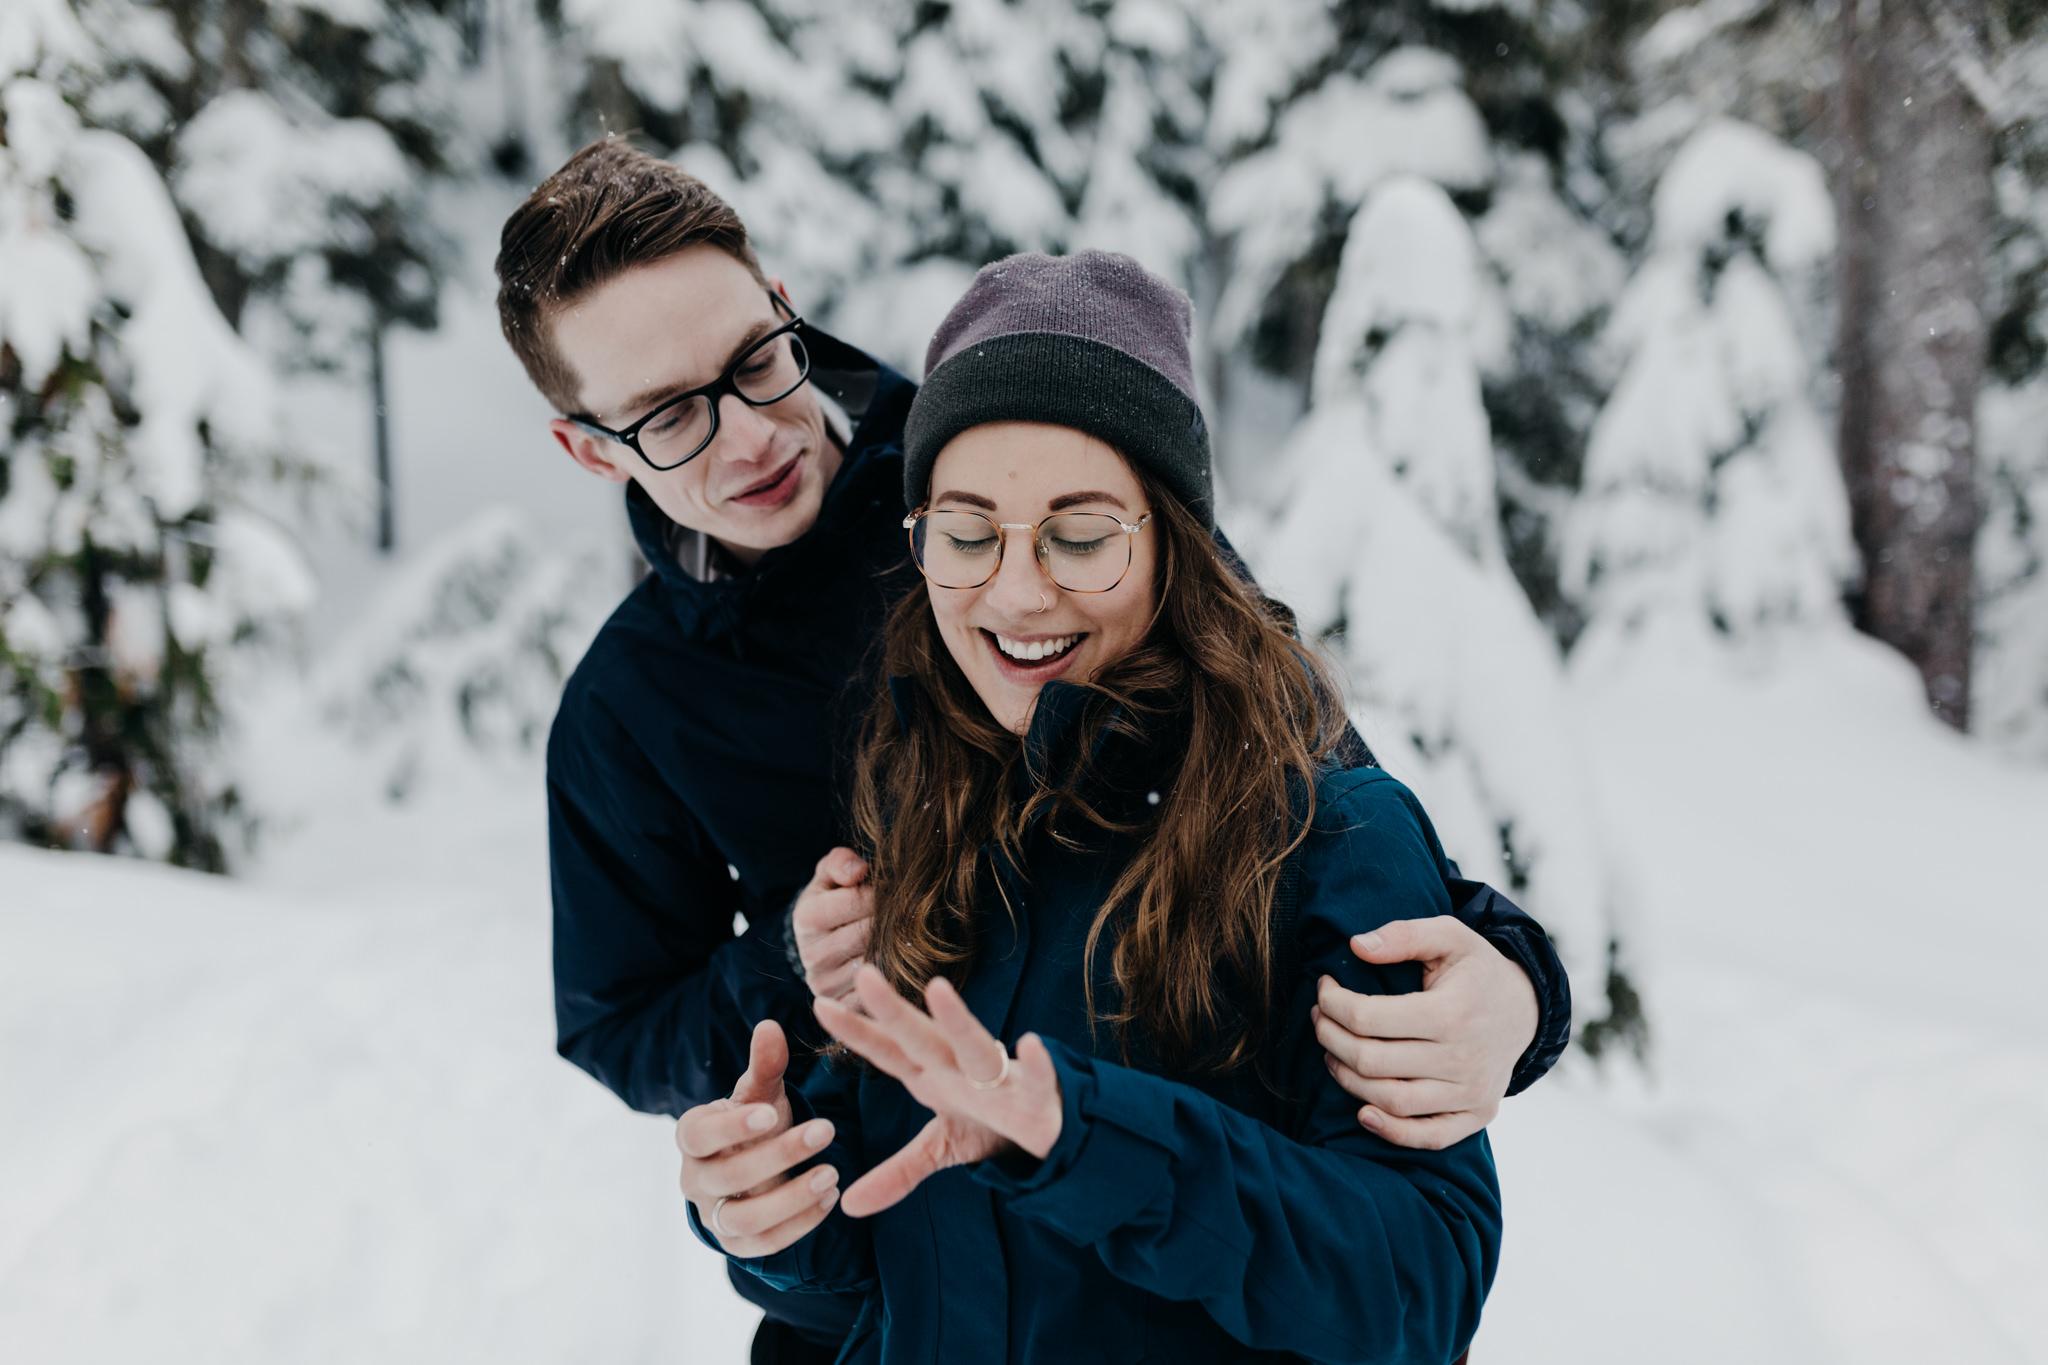 greg+jade-mount-washington-winter-engagement048.JPG